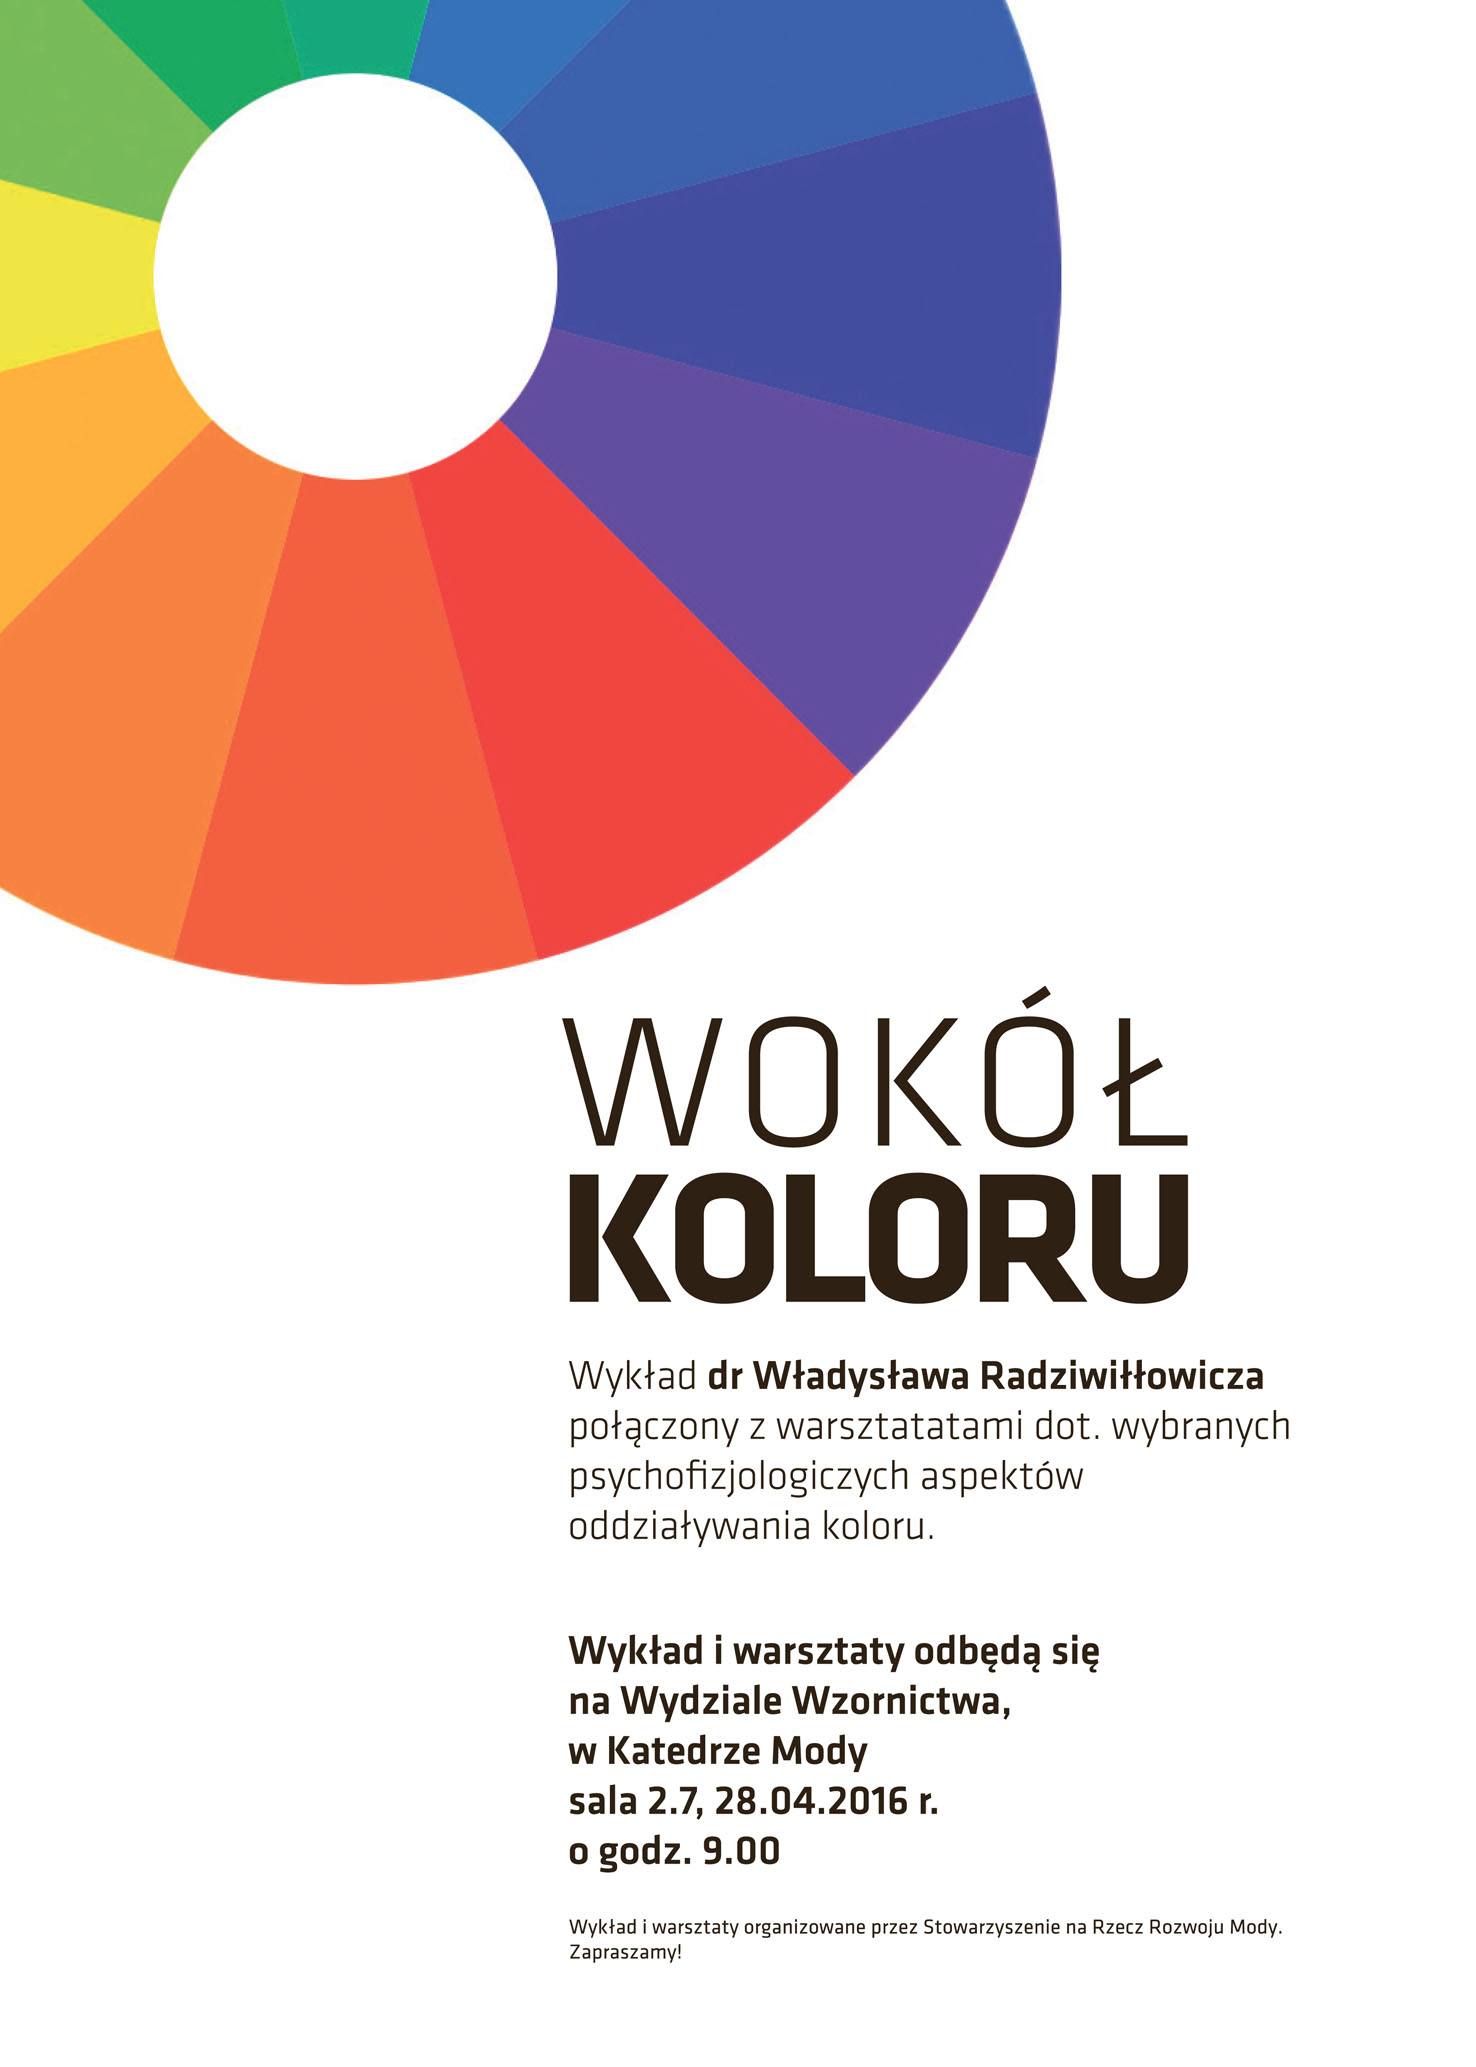 Plakat wokó³ koloru krzywe